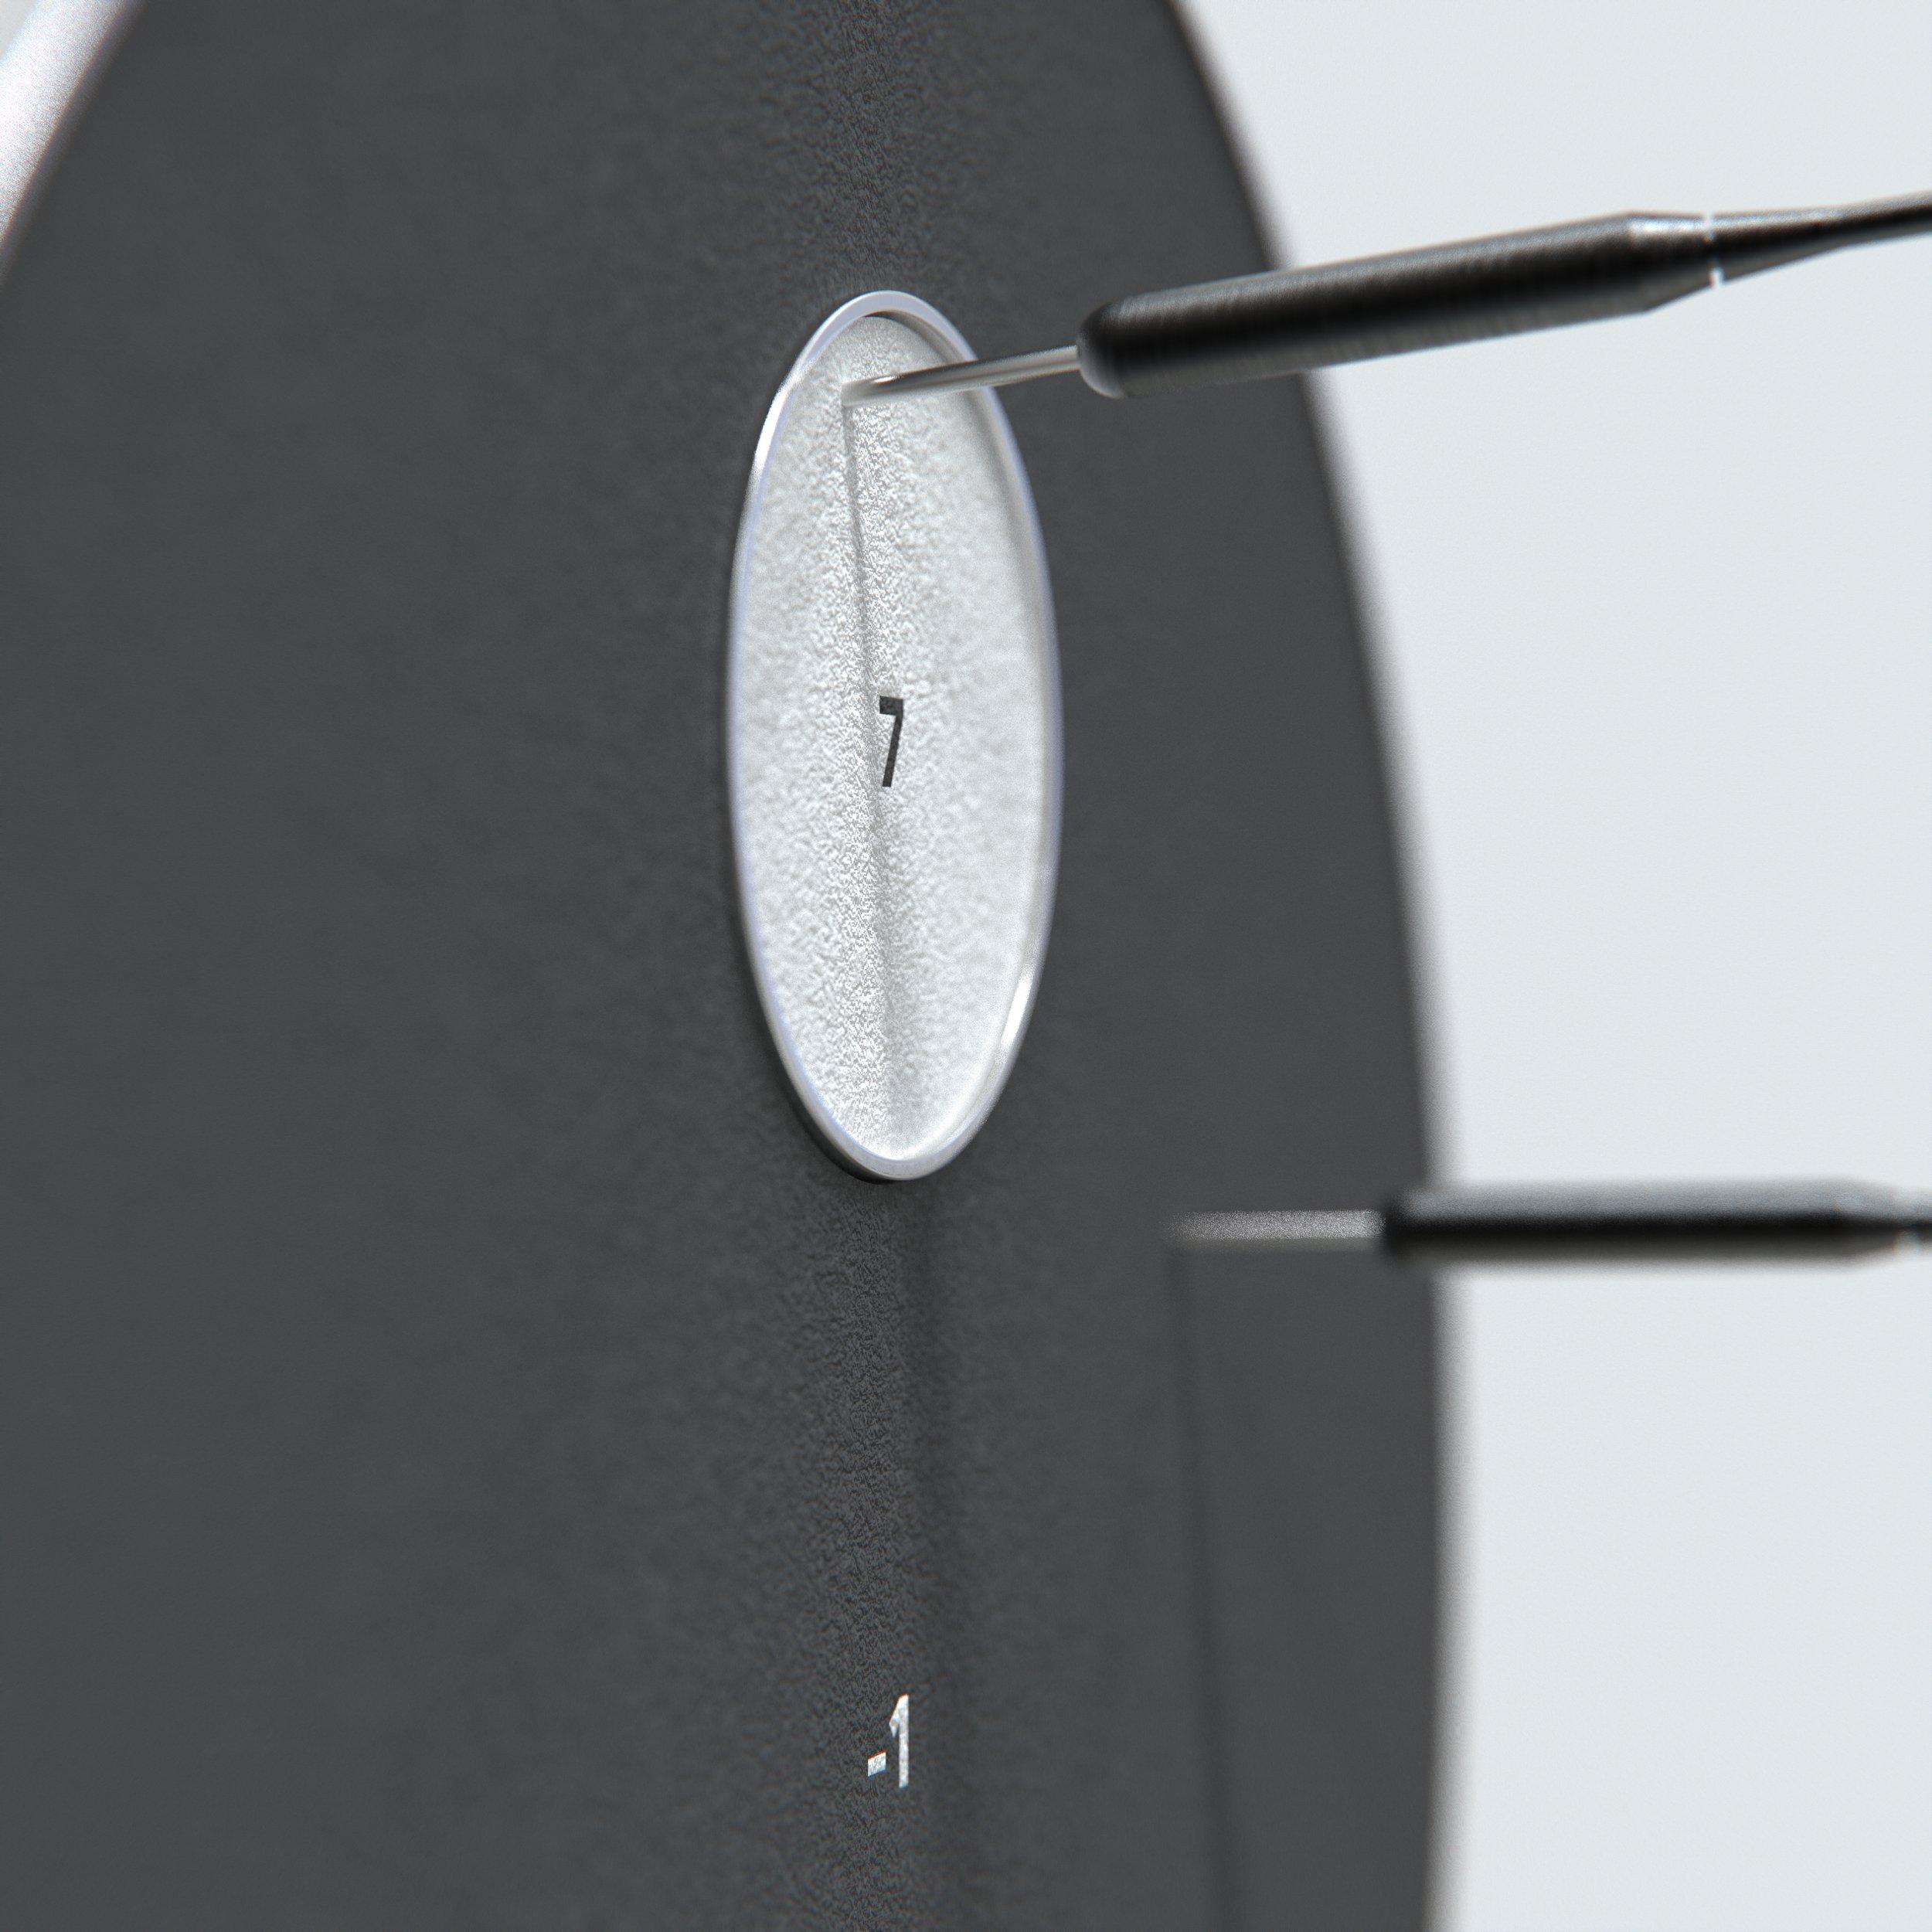 DARTBOARD-KEYSHOT-1.445.jpg